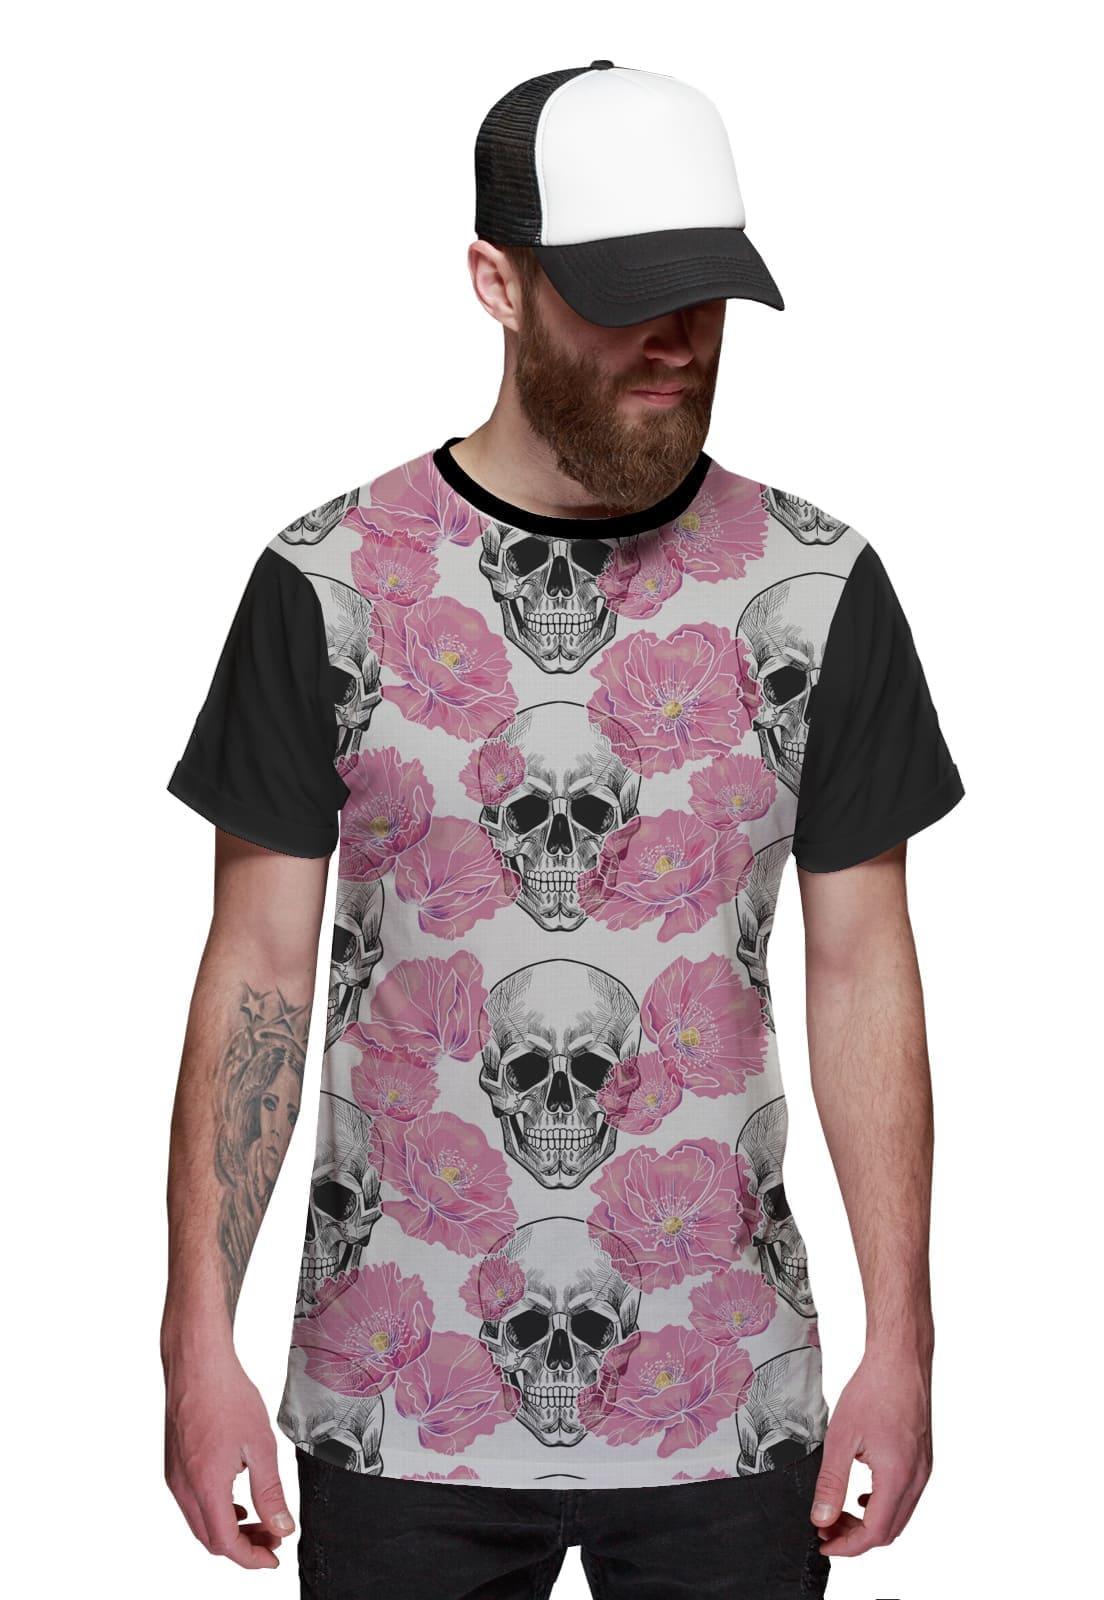 Camiseta T-shirt Rosa com caveira Floral Street Wear